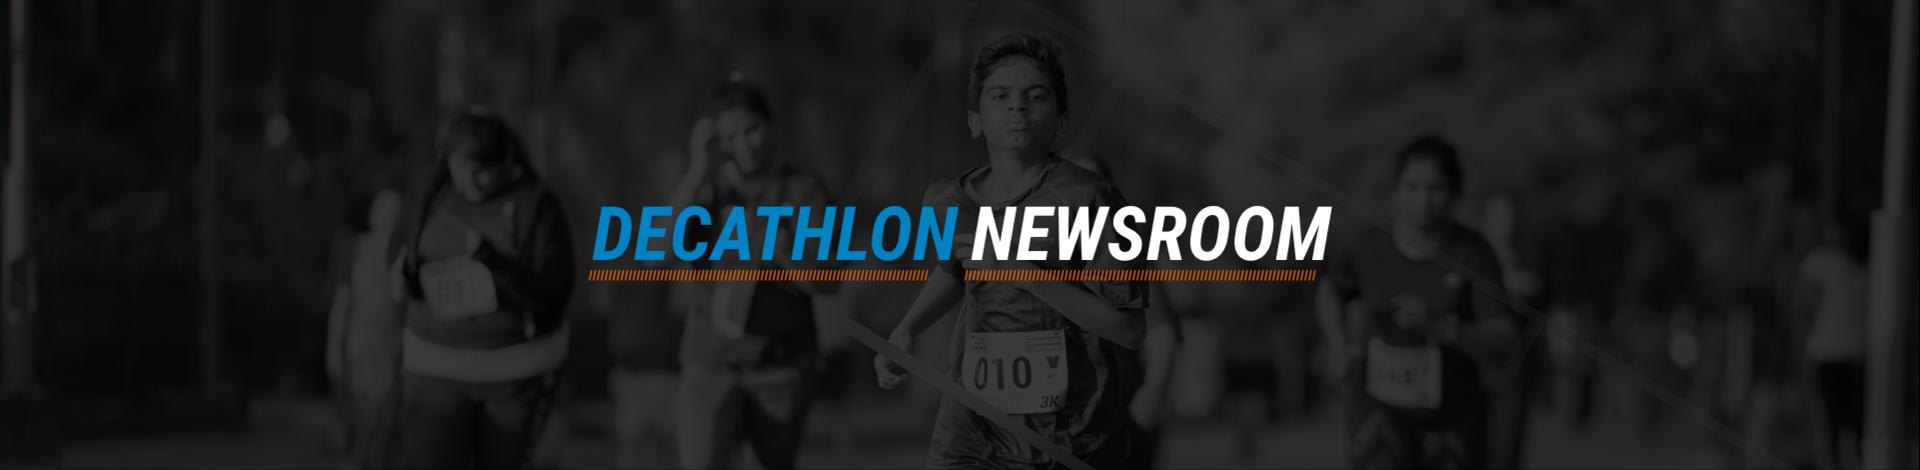 Decathlon Newsroom Main Banner